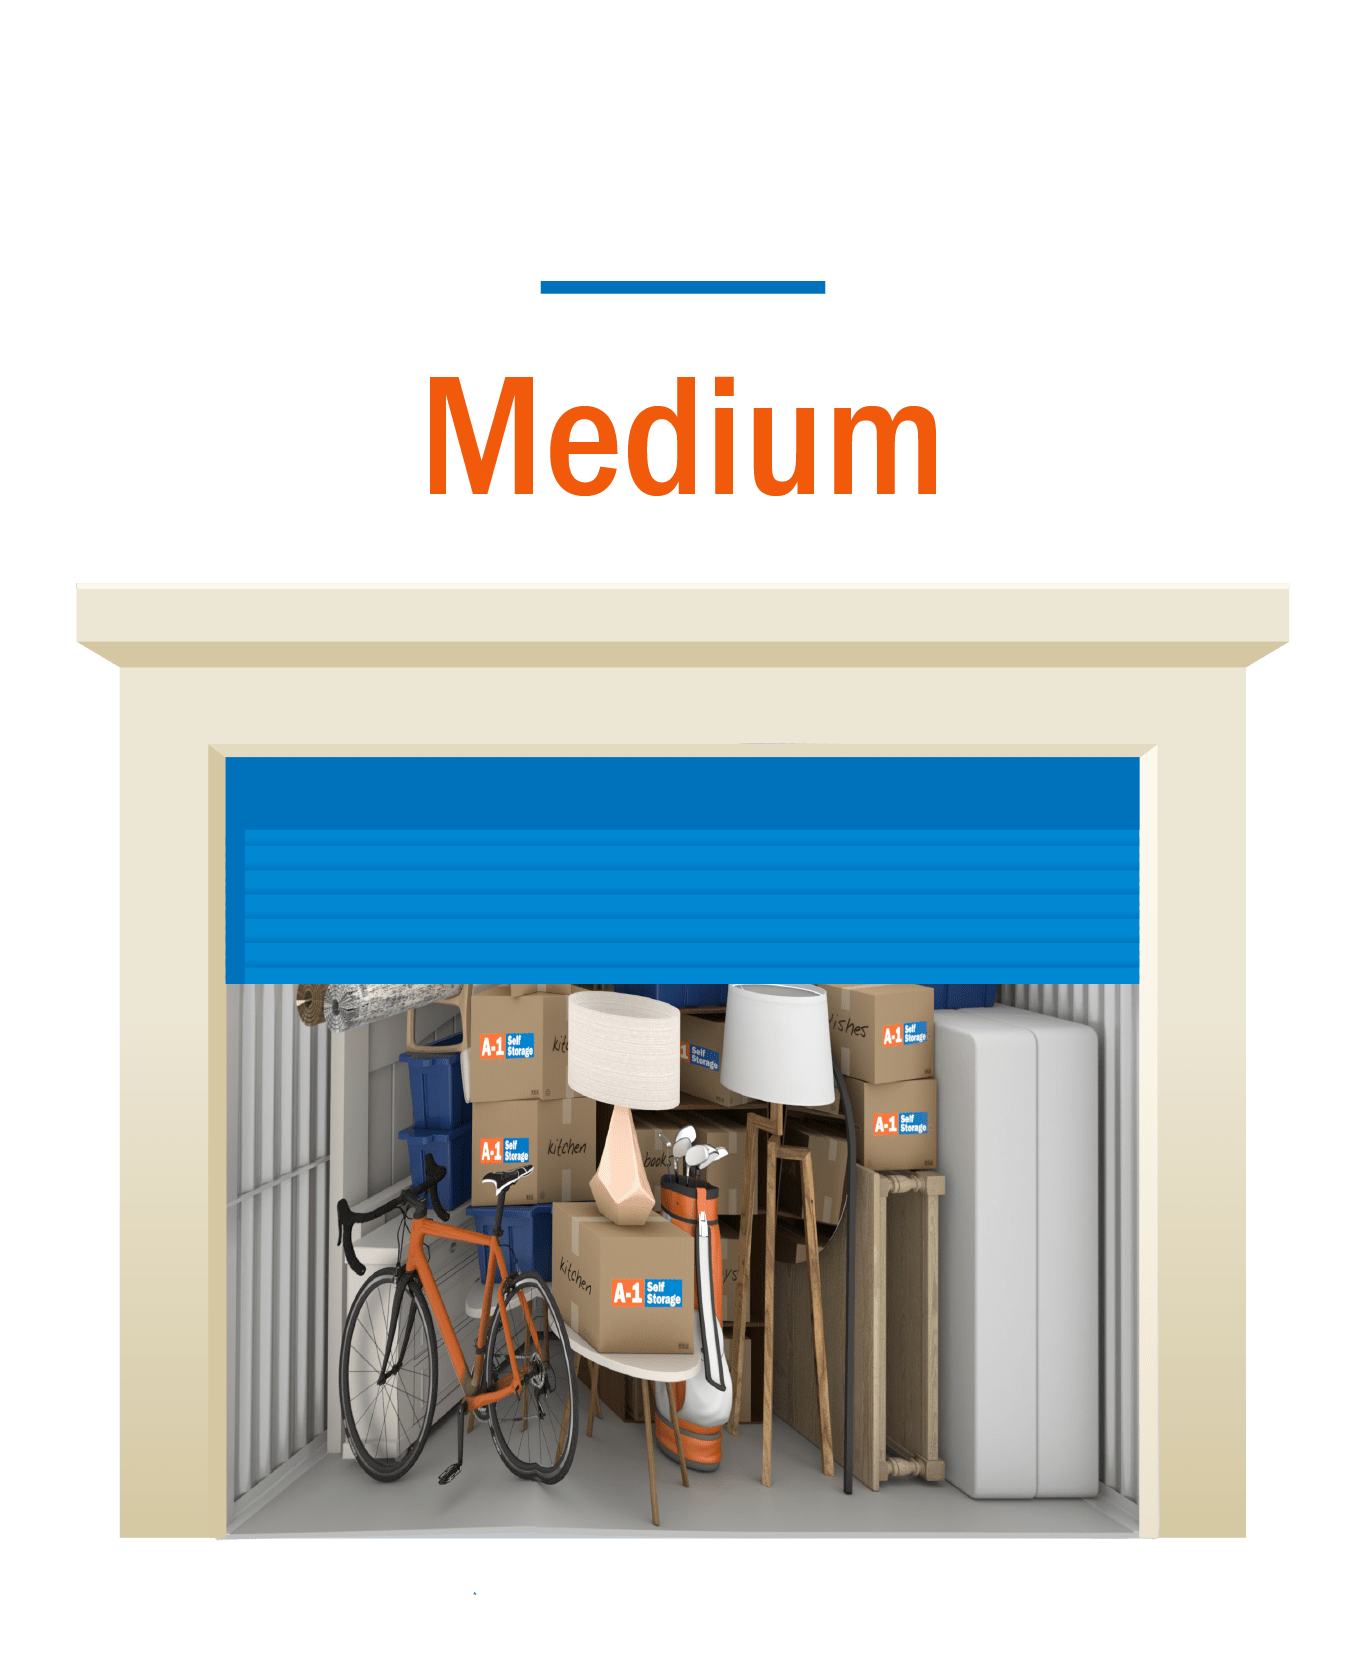 Medium storage unit graphic with open door